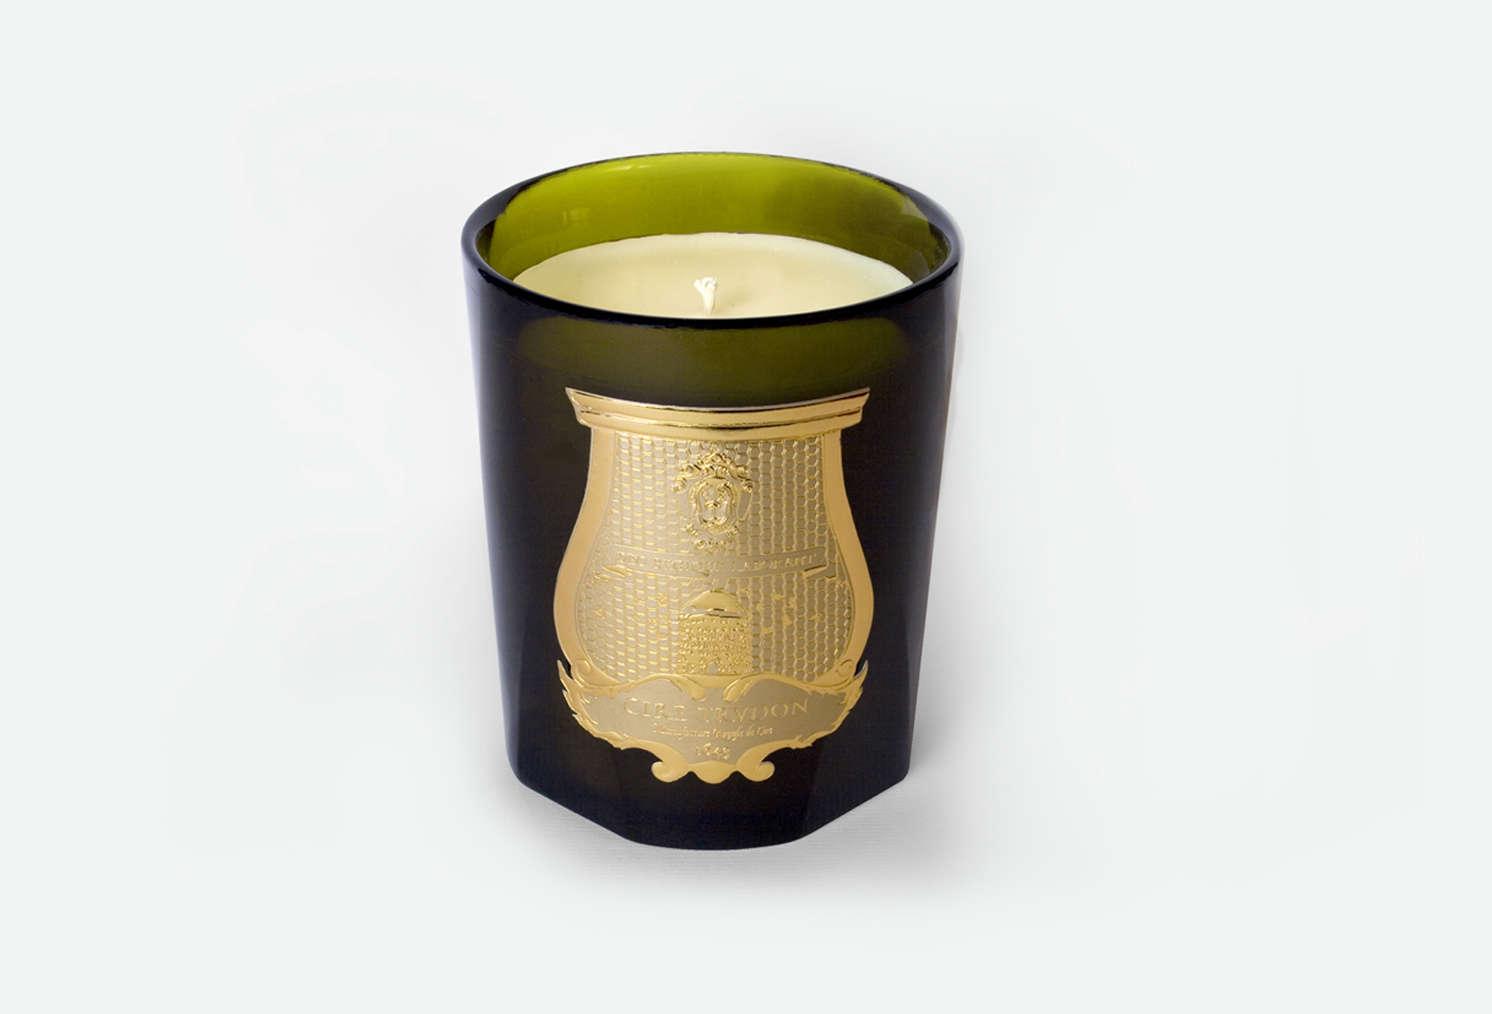 emperor candle by cire trudon 13